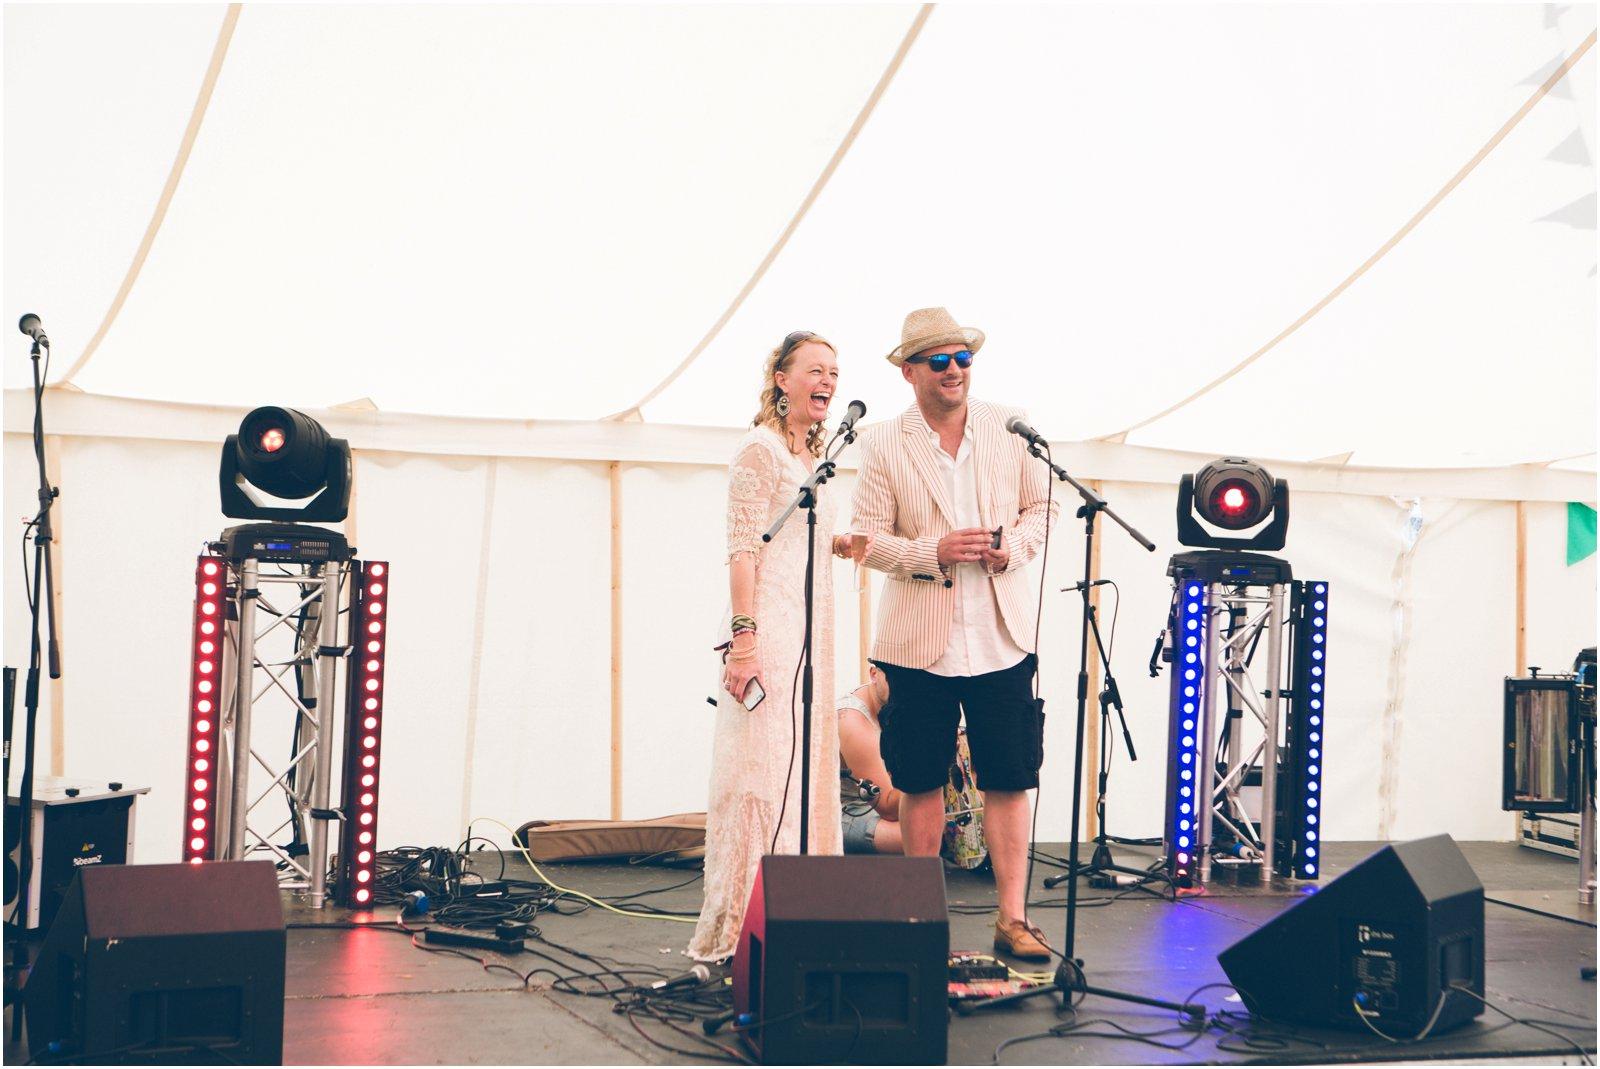 Sally and Damien's wedding festival by Summertown Pictures-36_DerrynSchmidt